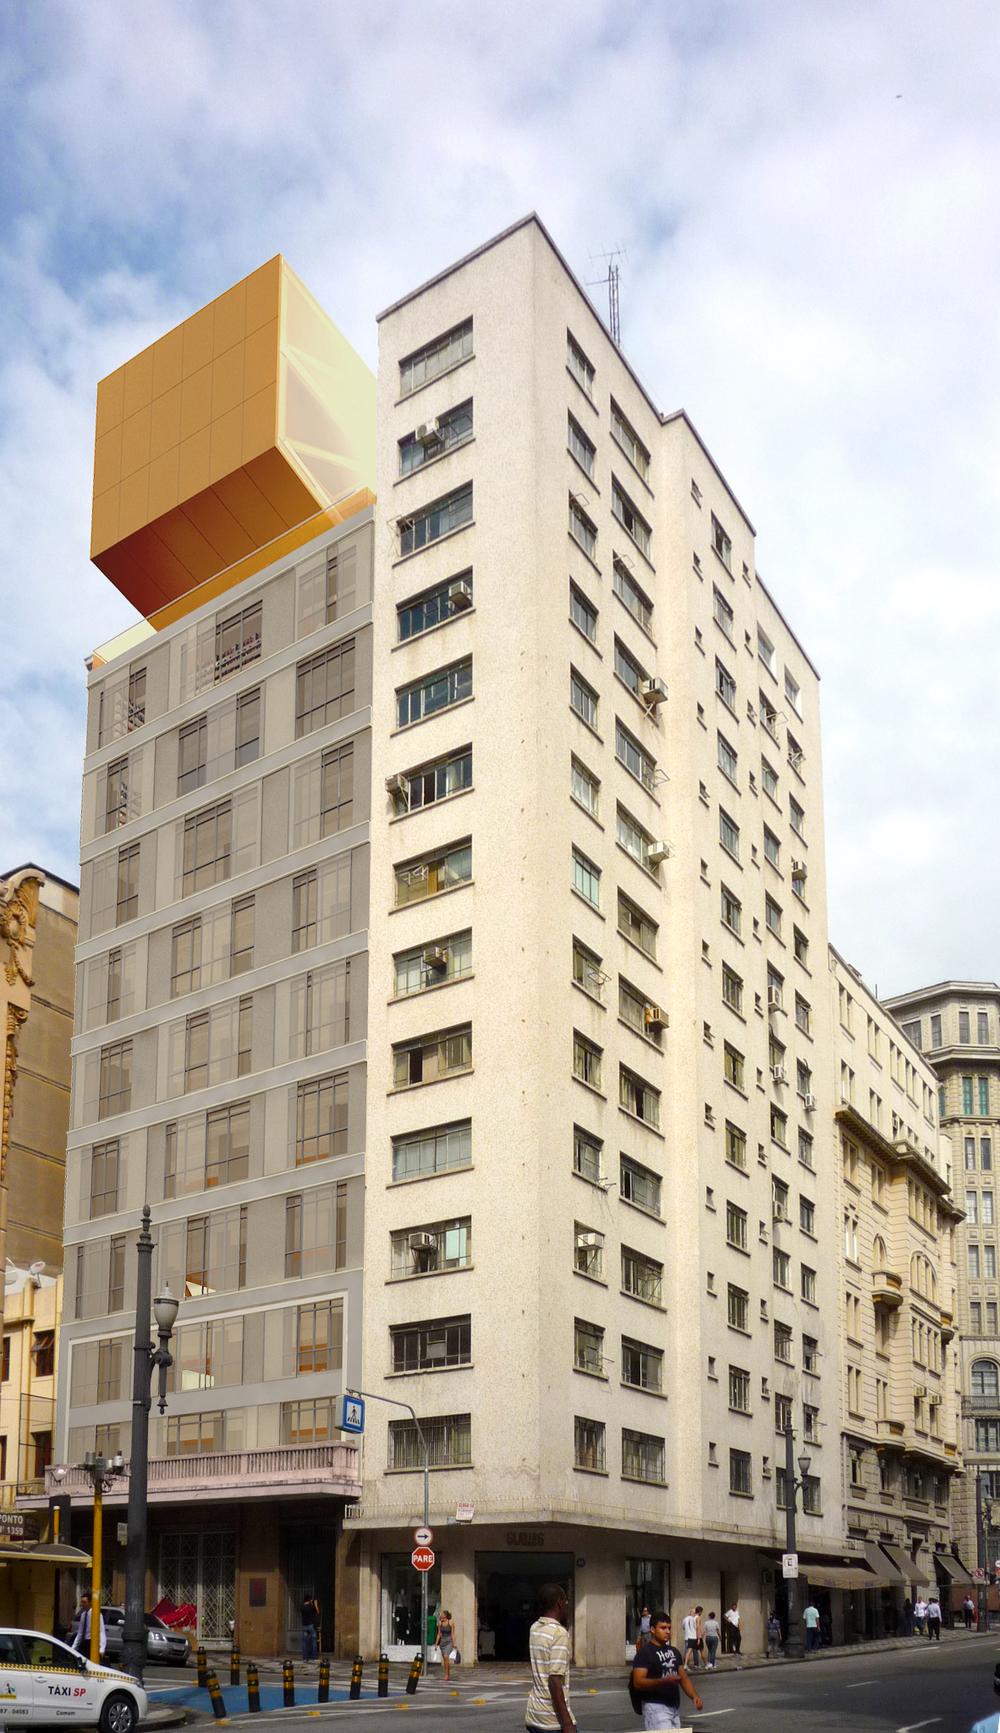 Fotoinserção-fachada_op1_corrigido.jpg